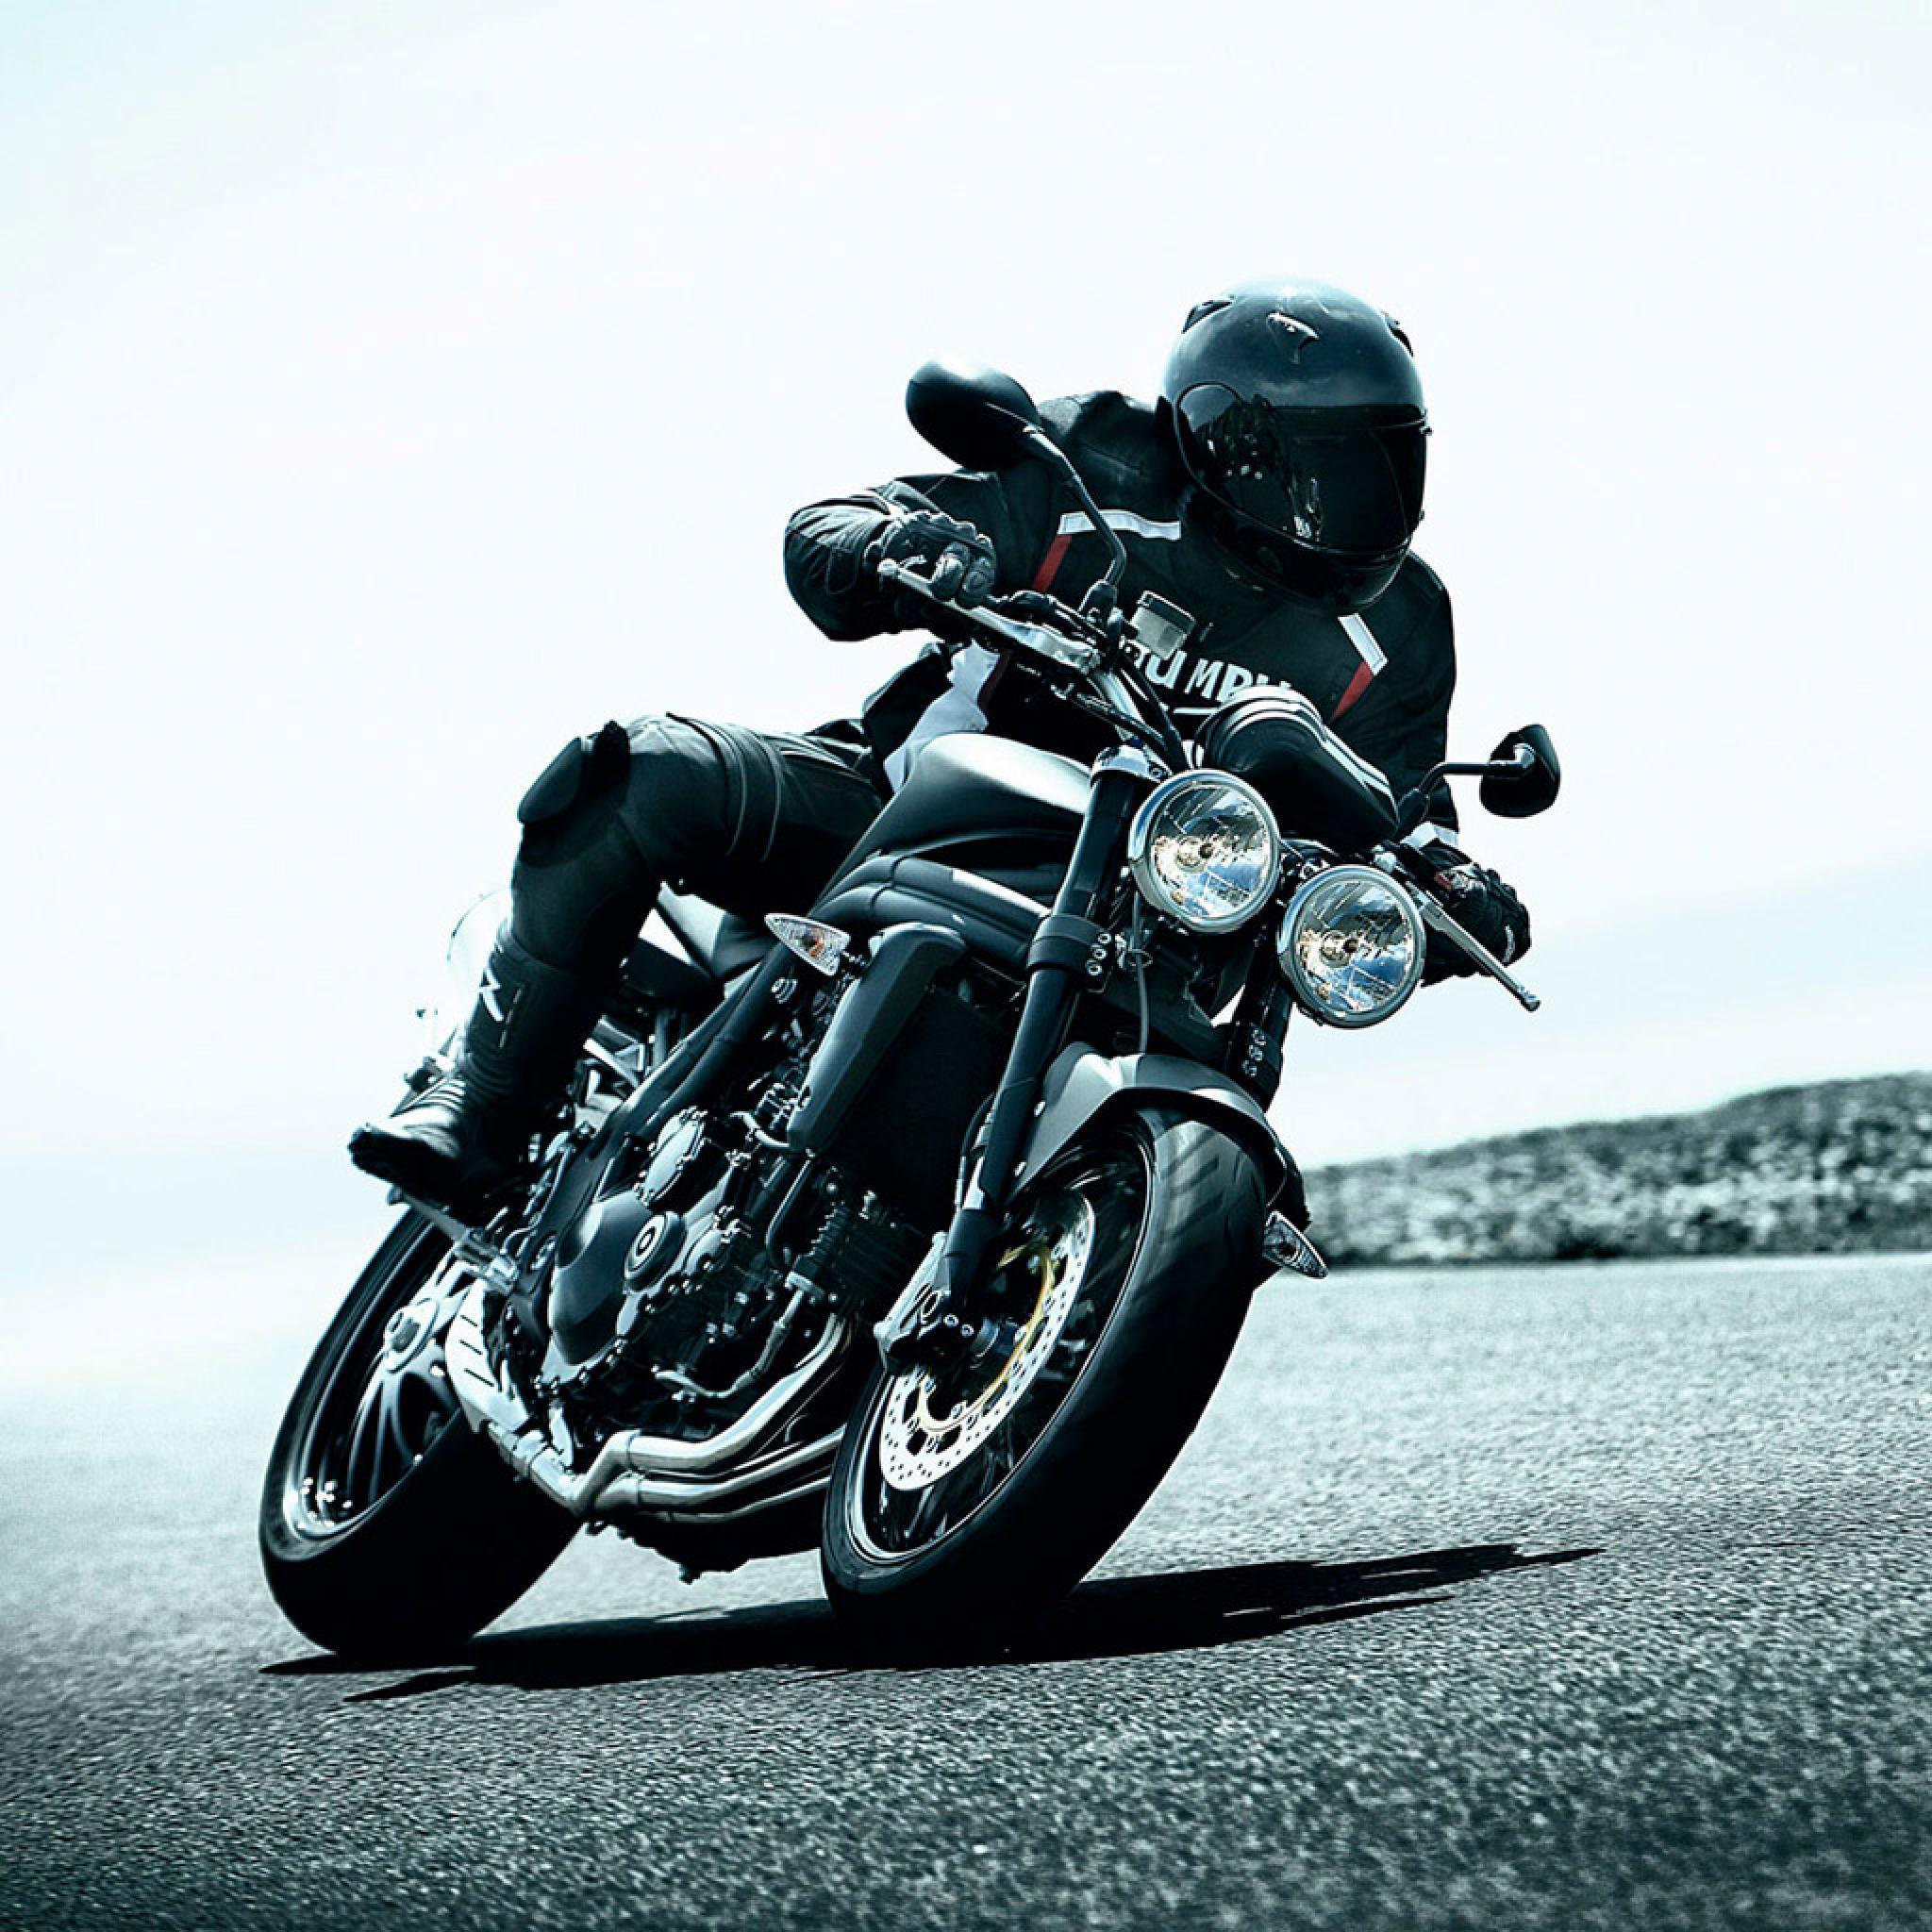 ukmoto import moto moto occasion moto anglaise moto angleterre 8 - RESERVER UNE INSPECTION MOTO PAR VOTRE MANDATAIRE MOTO UKMOTO